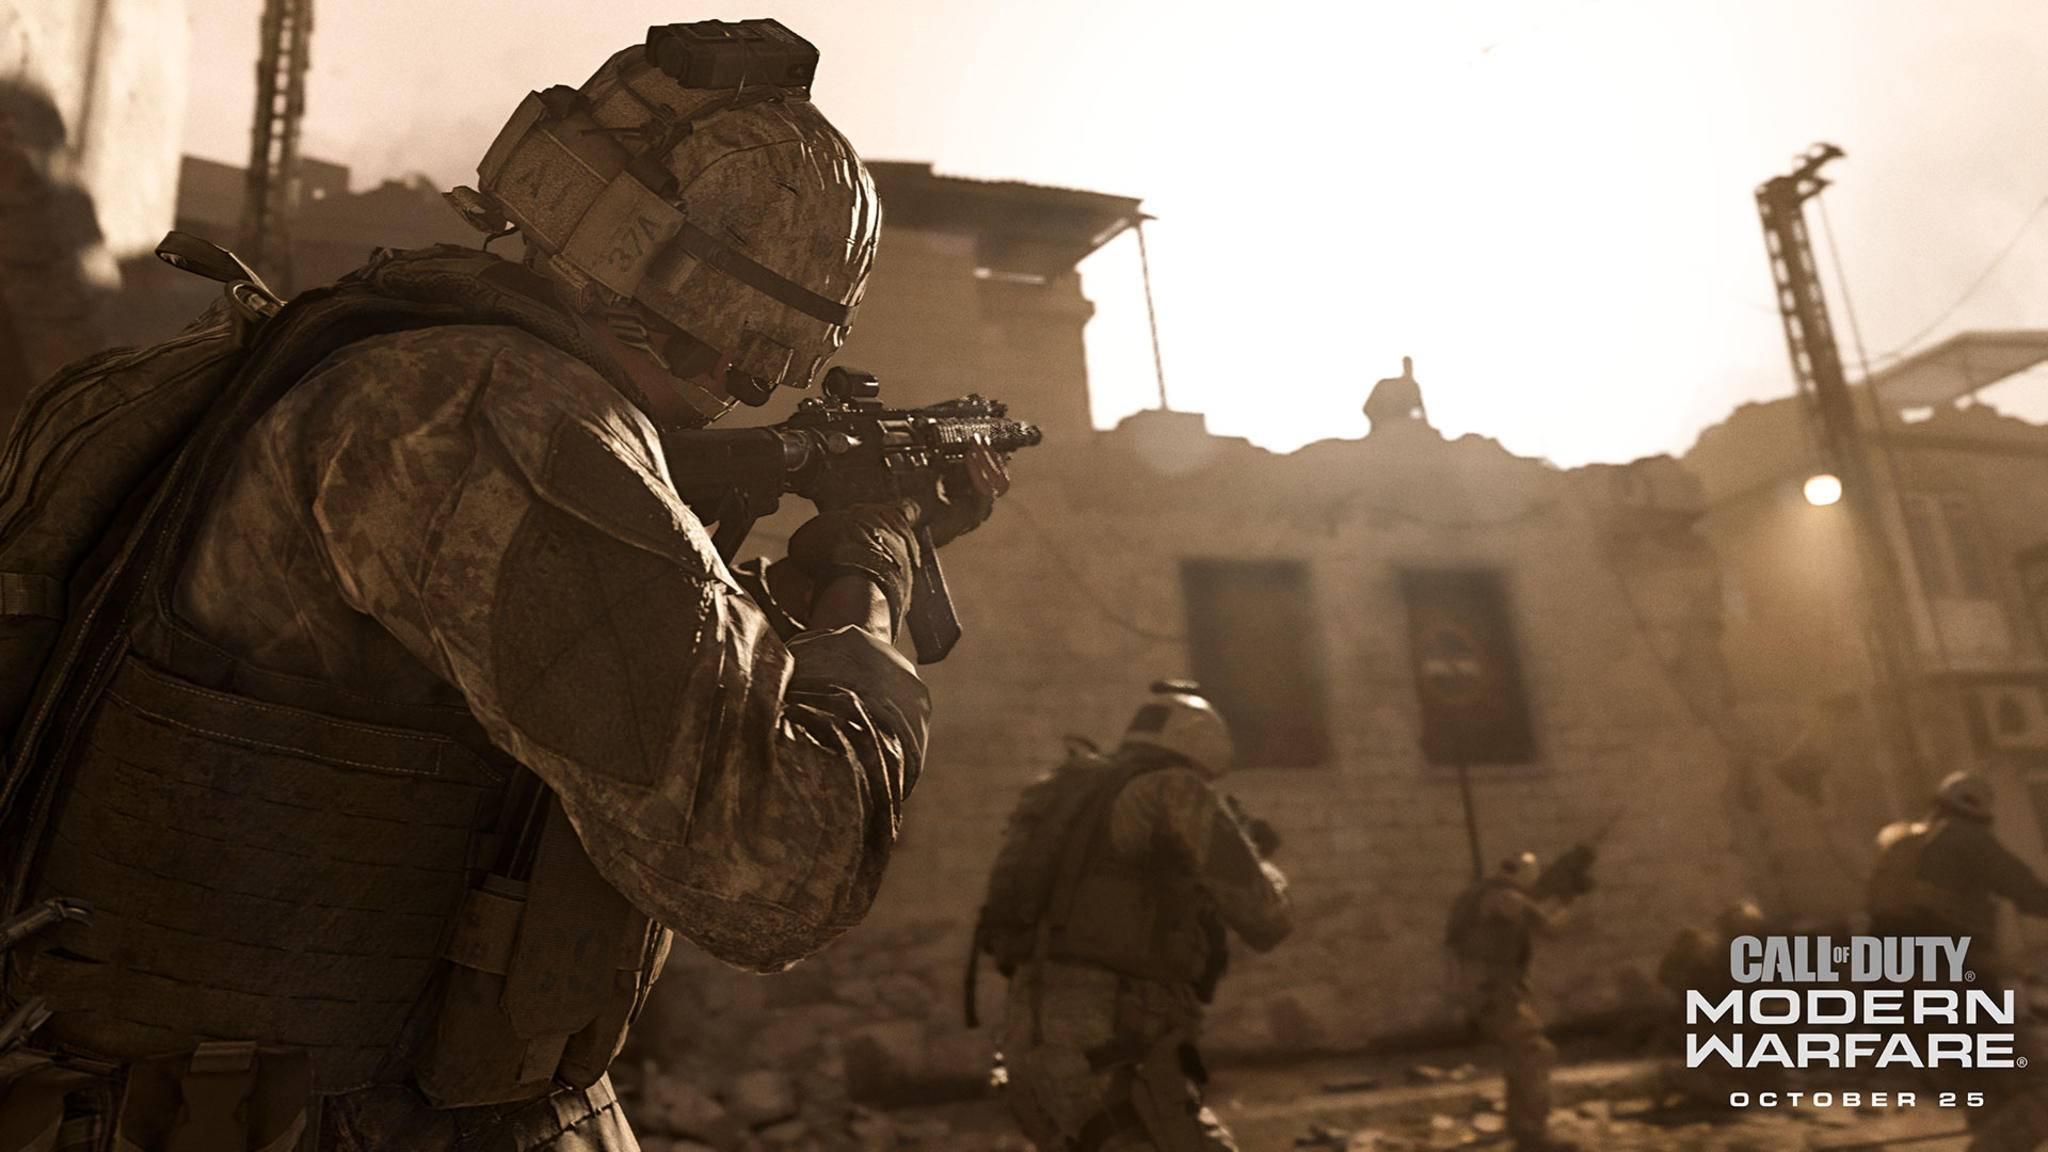 call-of-duty-modern-warfare-truemmer